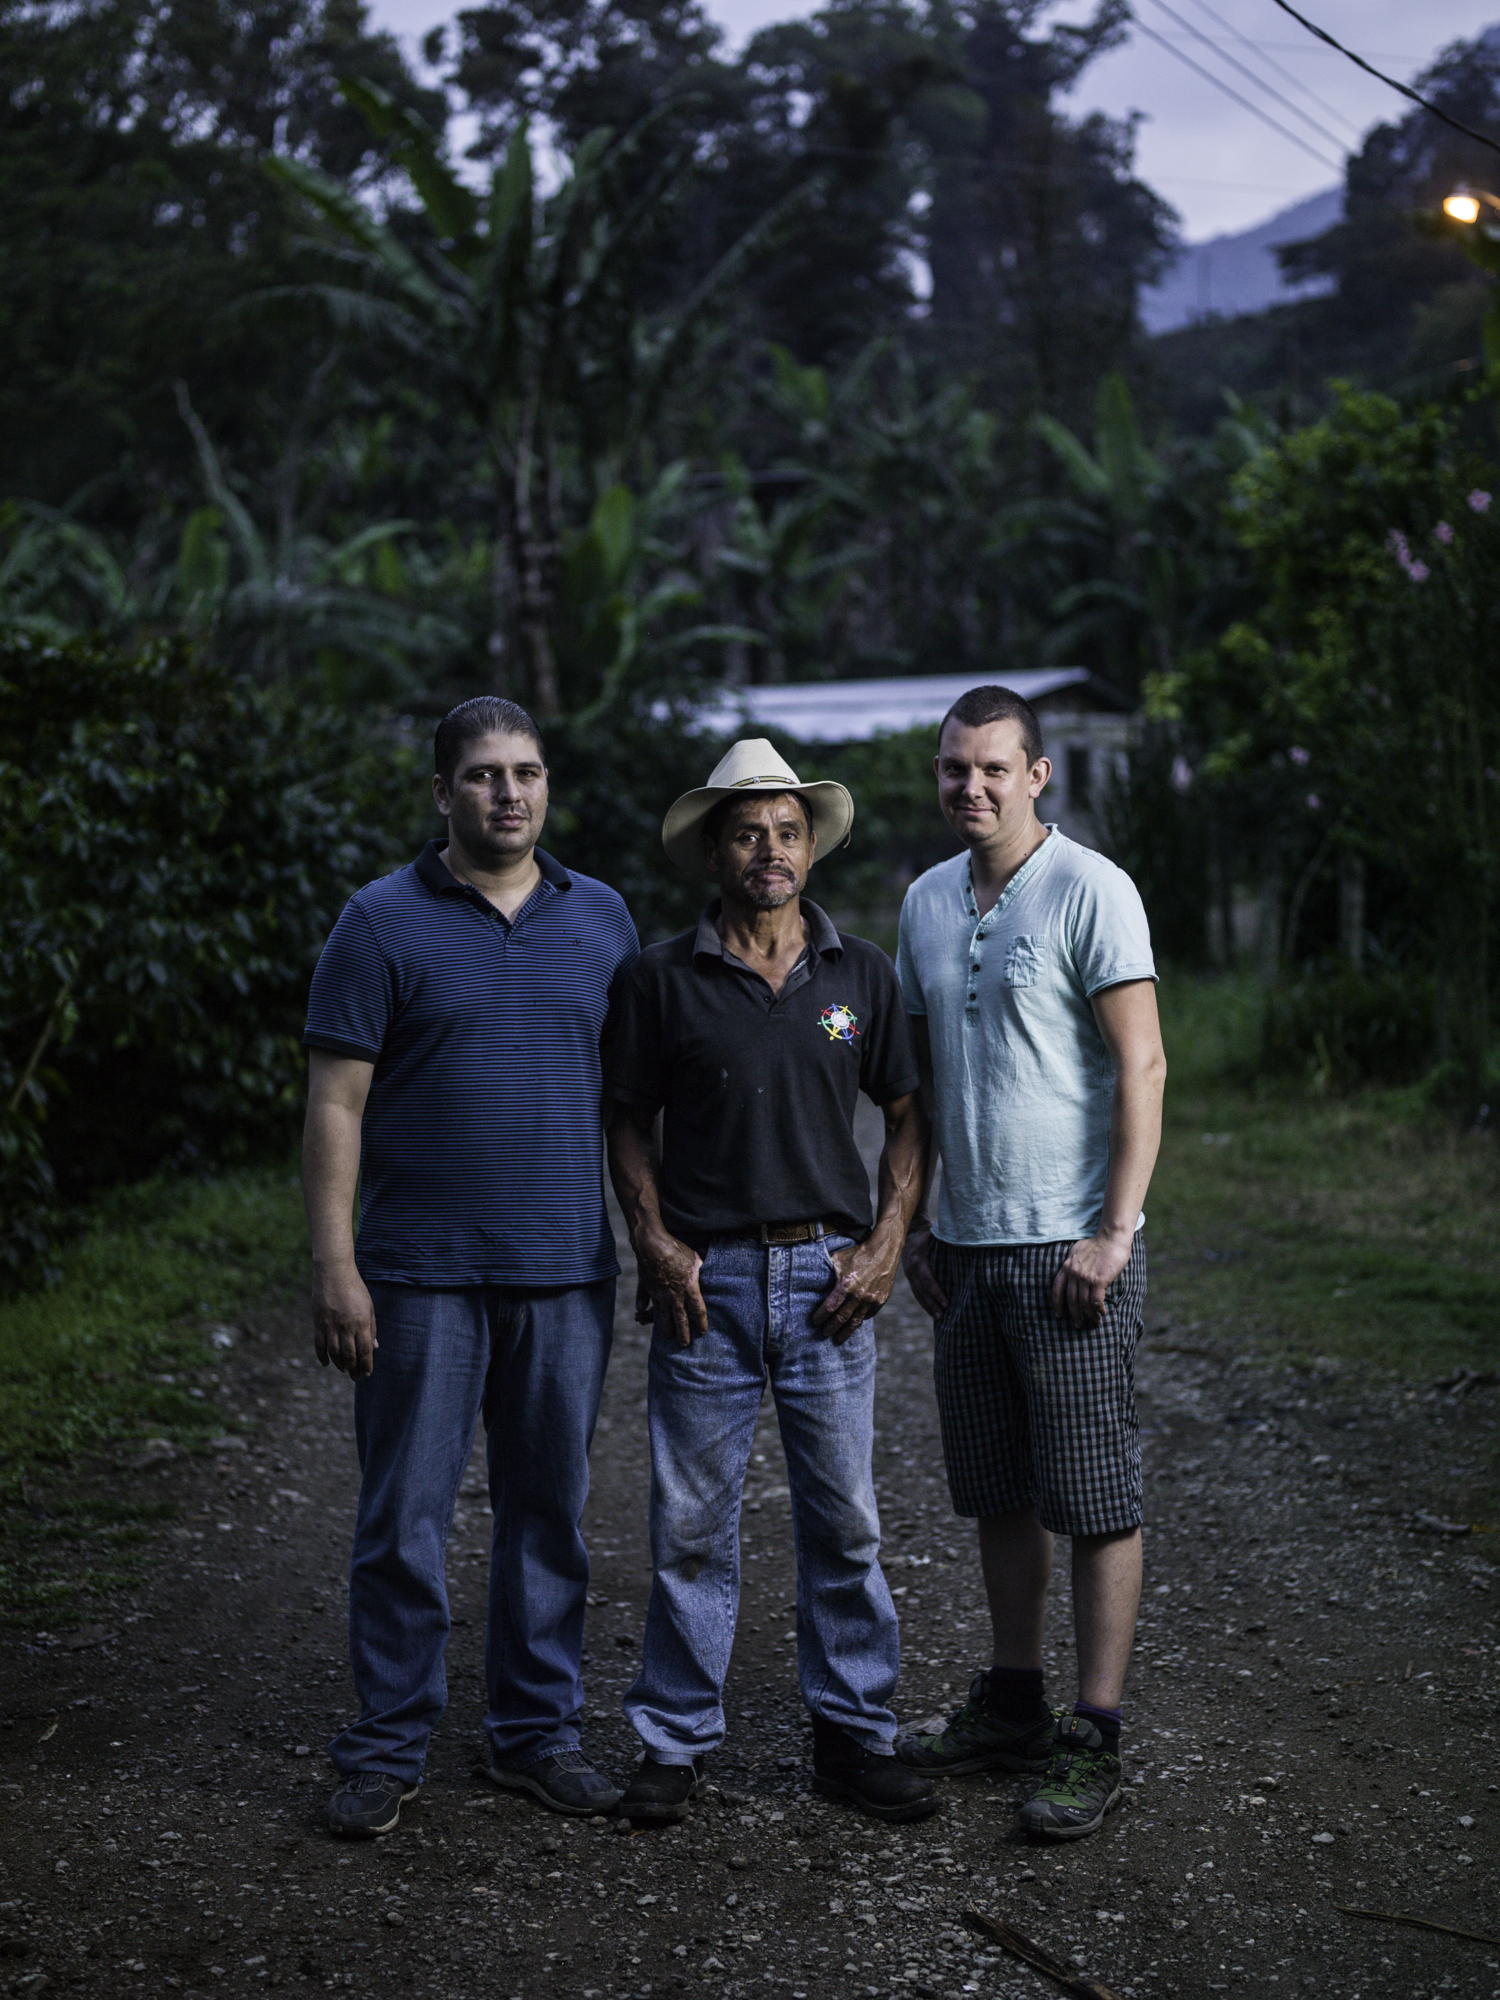 From L: Fidel Paz (Exportadora San Vicente), Eulogio, Bjørnar (CCS)